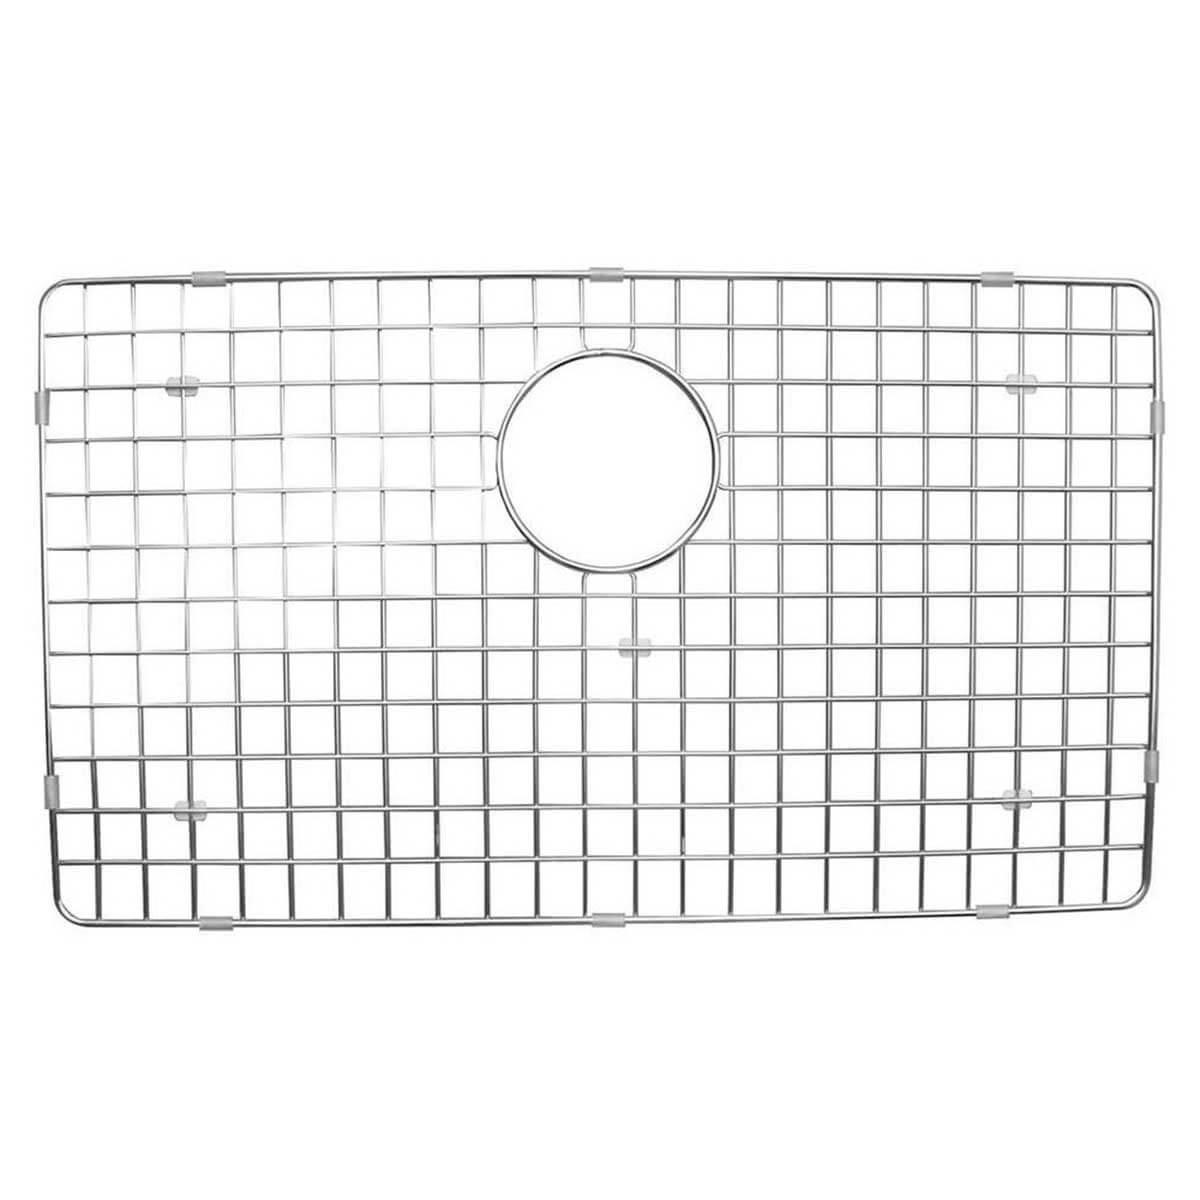 Artisan Chef Pro Grids BG-2615S